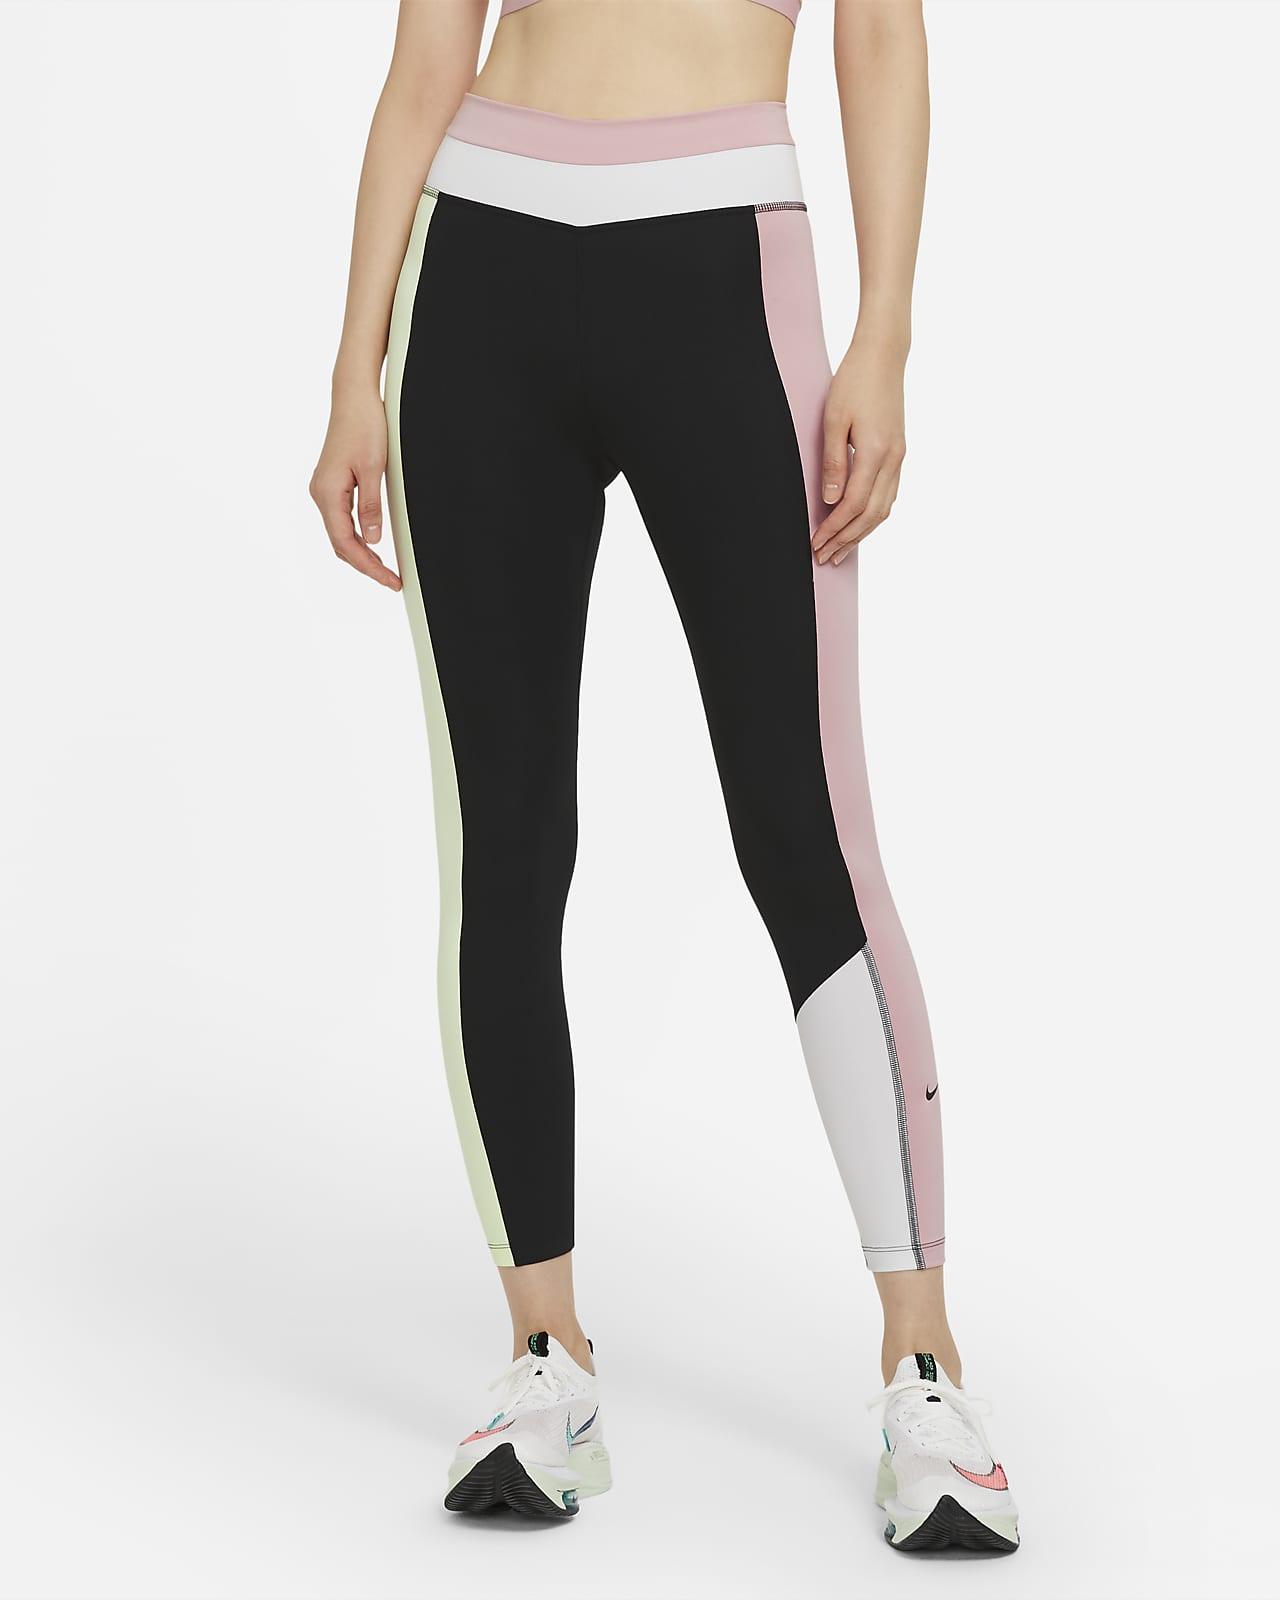 Nike One 女款中腰色塊九分內搭褲